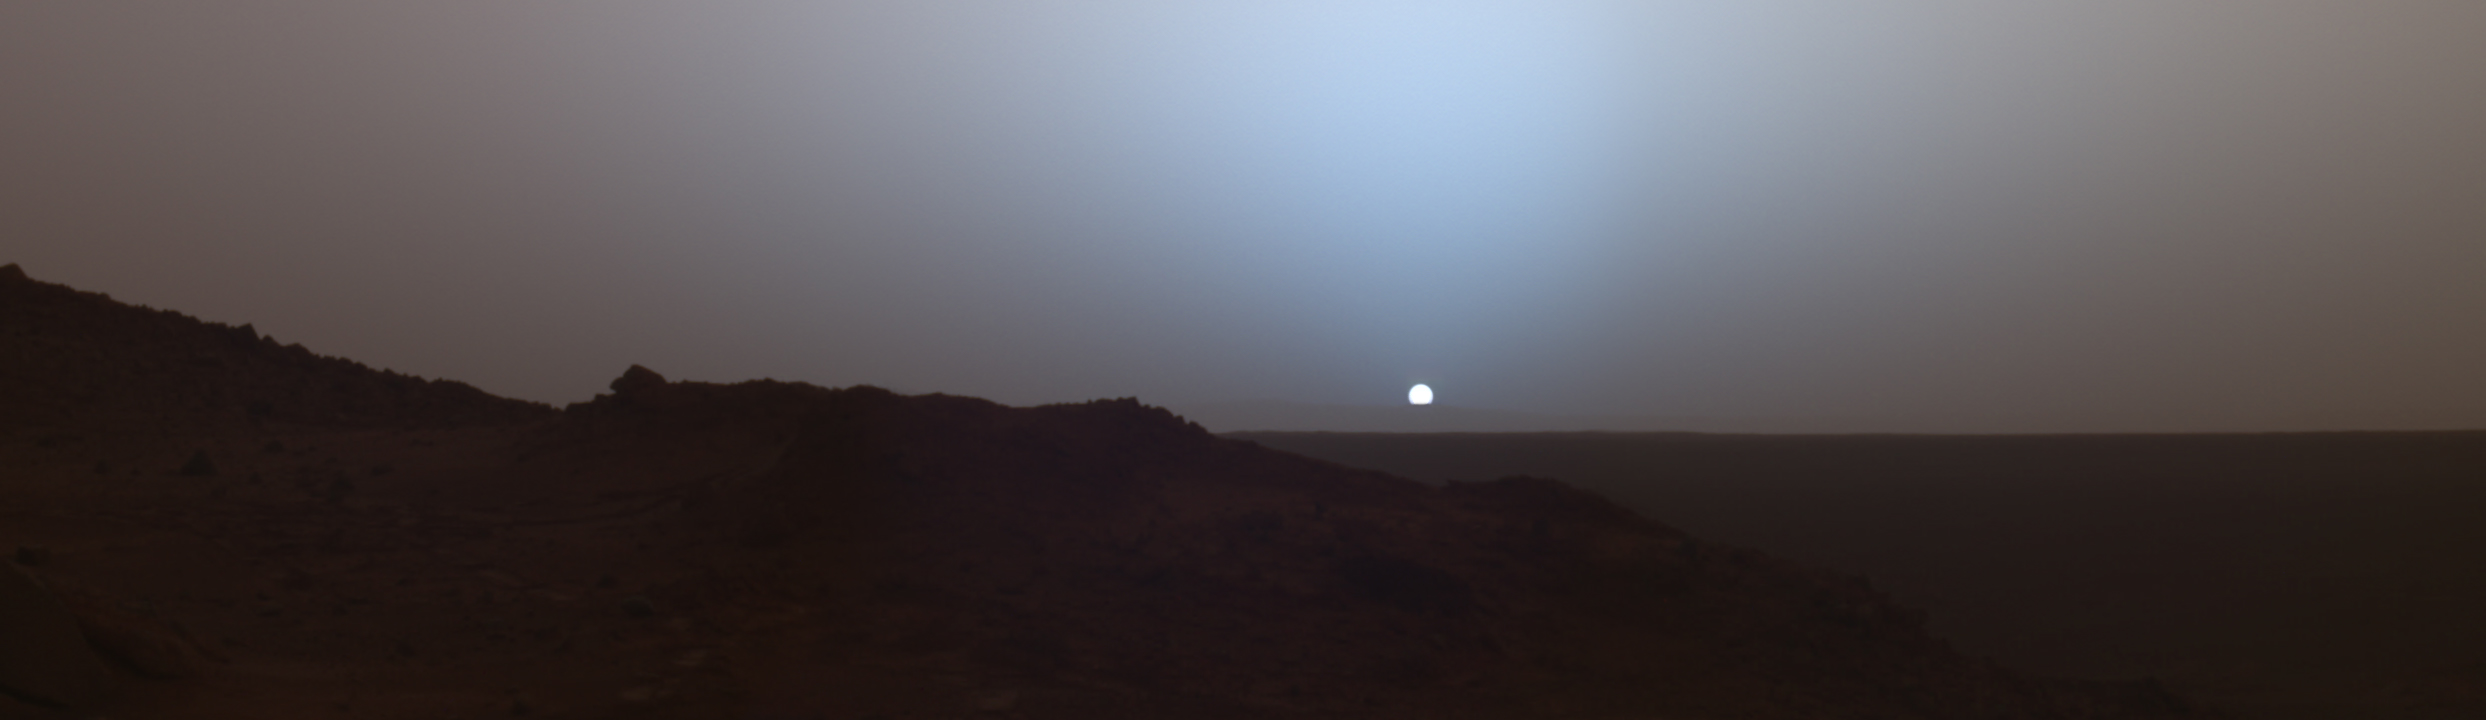 Закат Солнца на Марсе | NASA